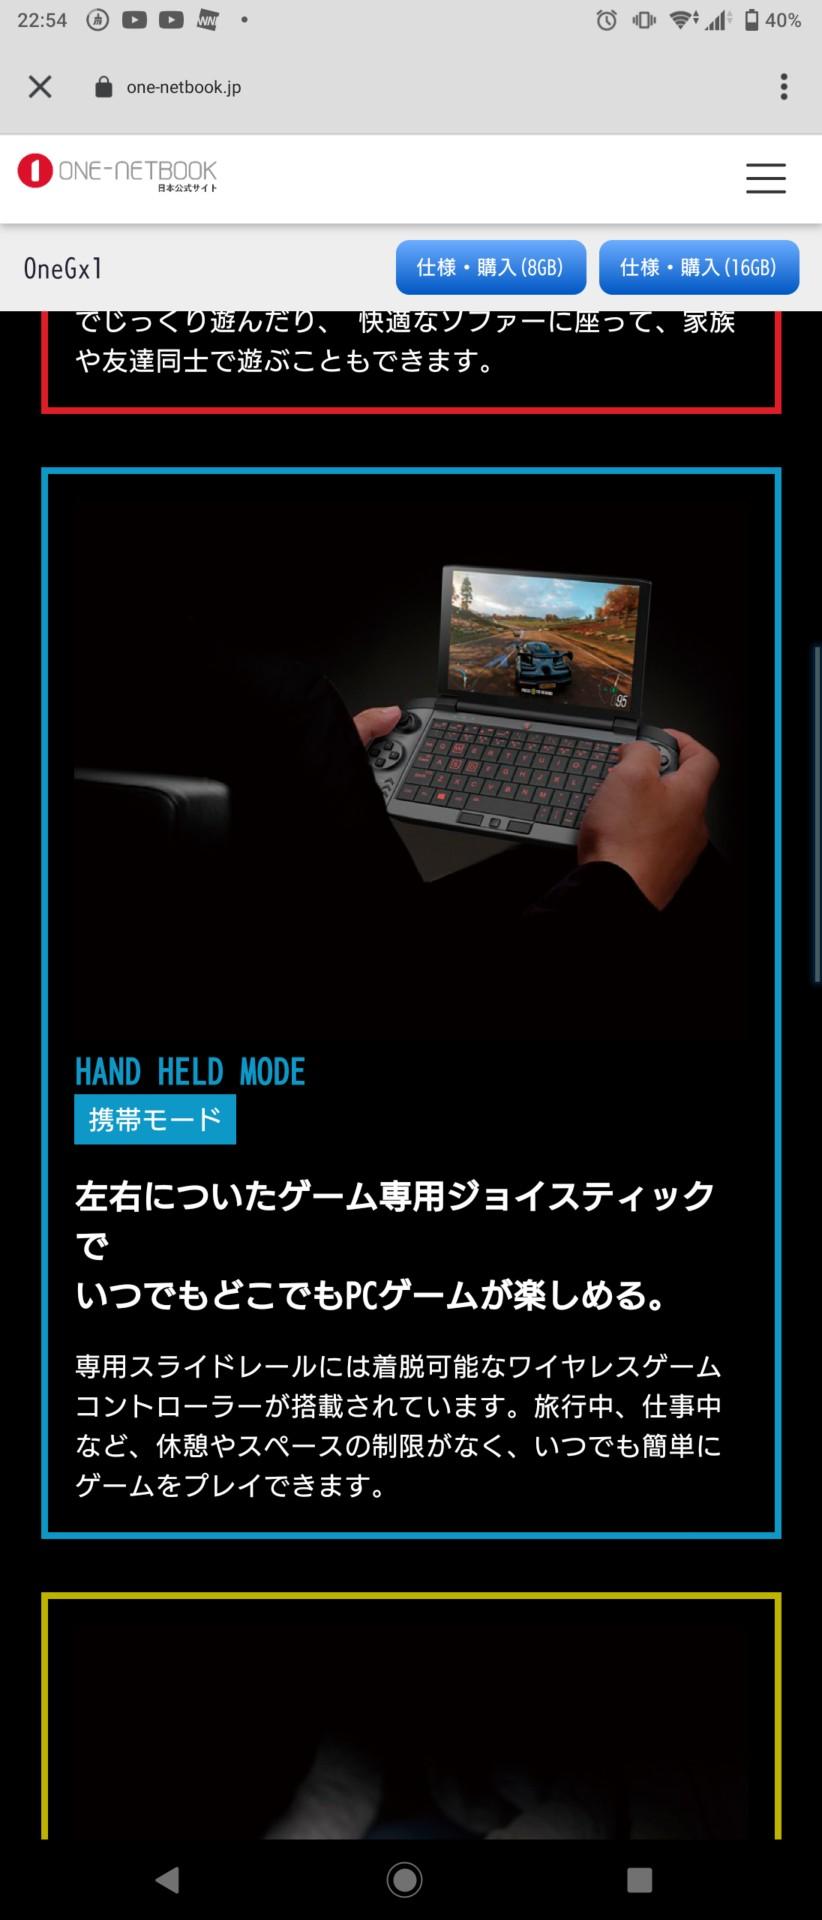 rmoW3o0 - 【スイッチ死亡】5G対応のゲーム機 ONE-GXが登場!!新たな伝説が始まる...